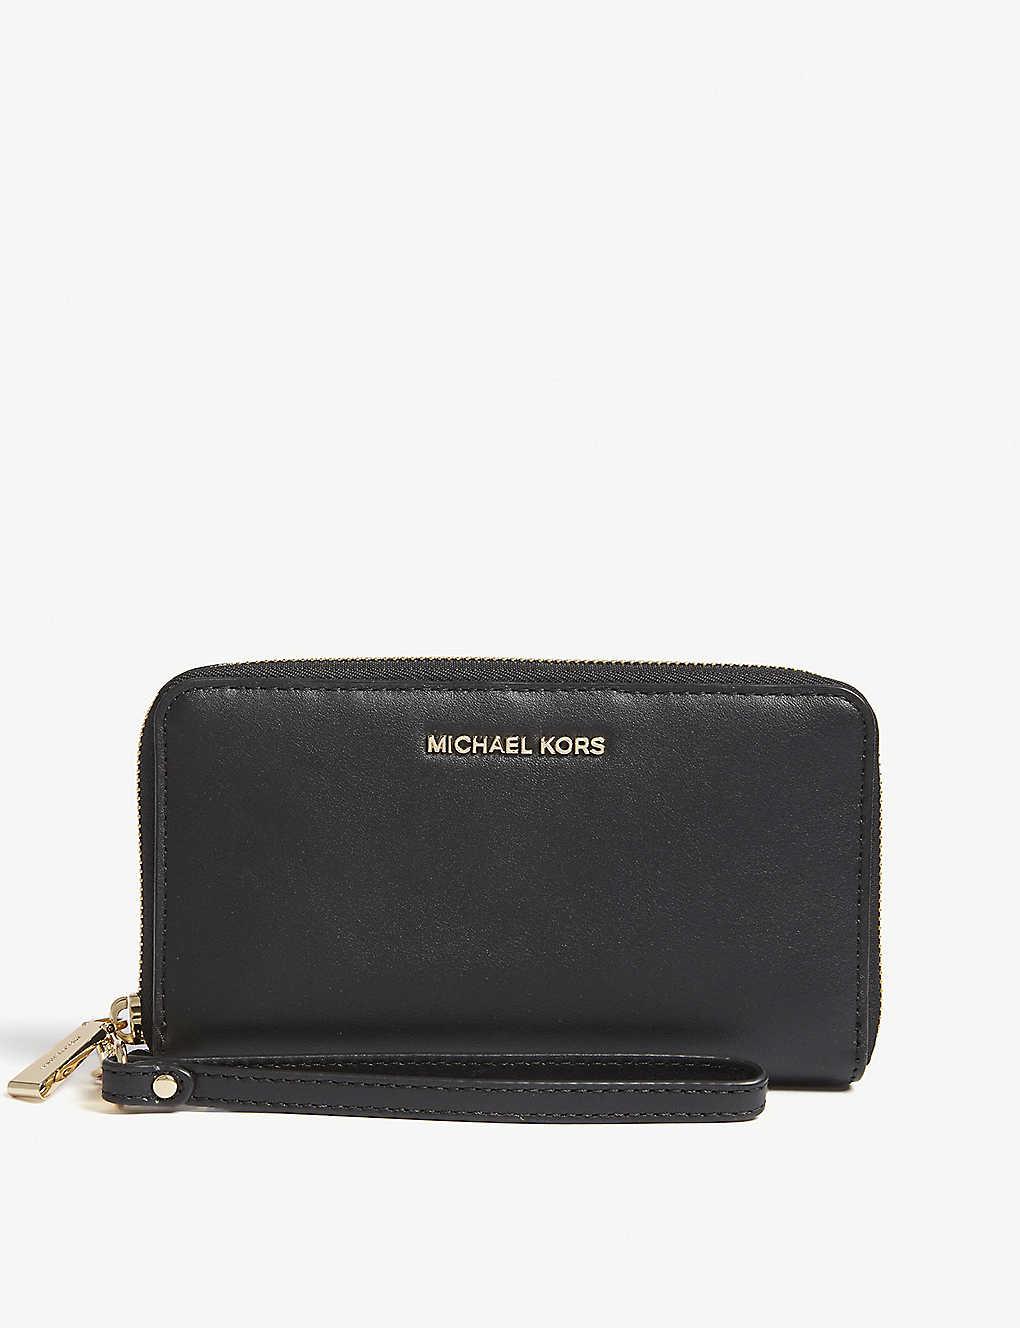 3c58f7a2e09359 MICHAEL MICHAEL KORS - Wristlets leather phone purse | Selfridges.com